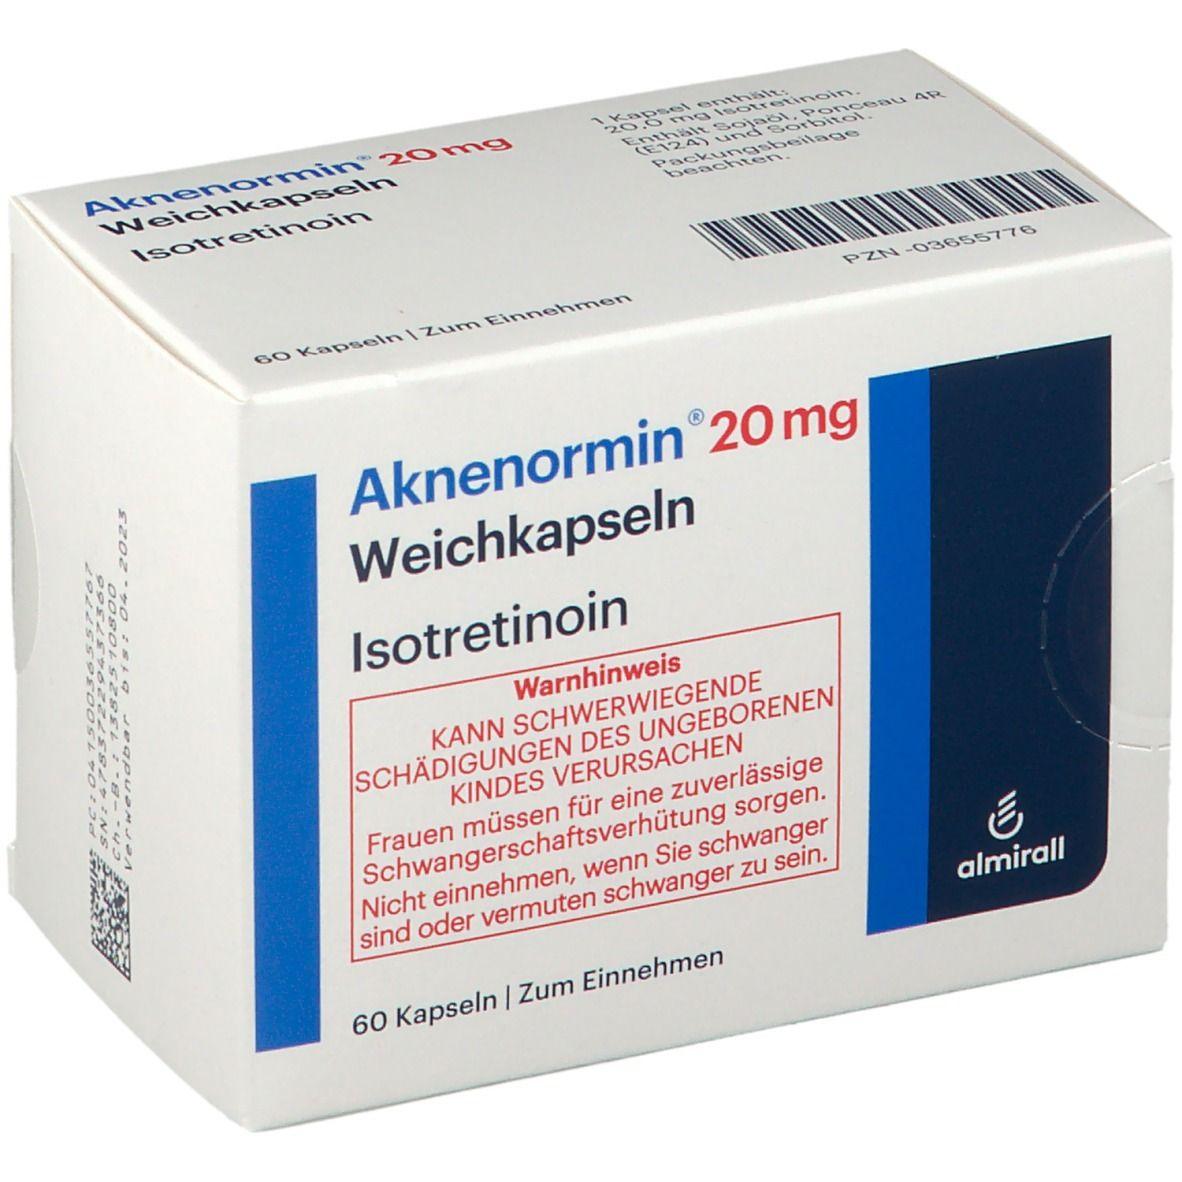 Aknenormin® 20 mg 60 St - shop-apotheke.com